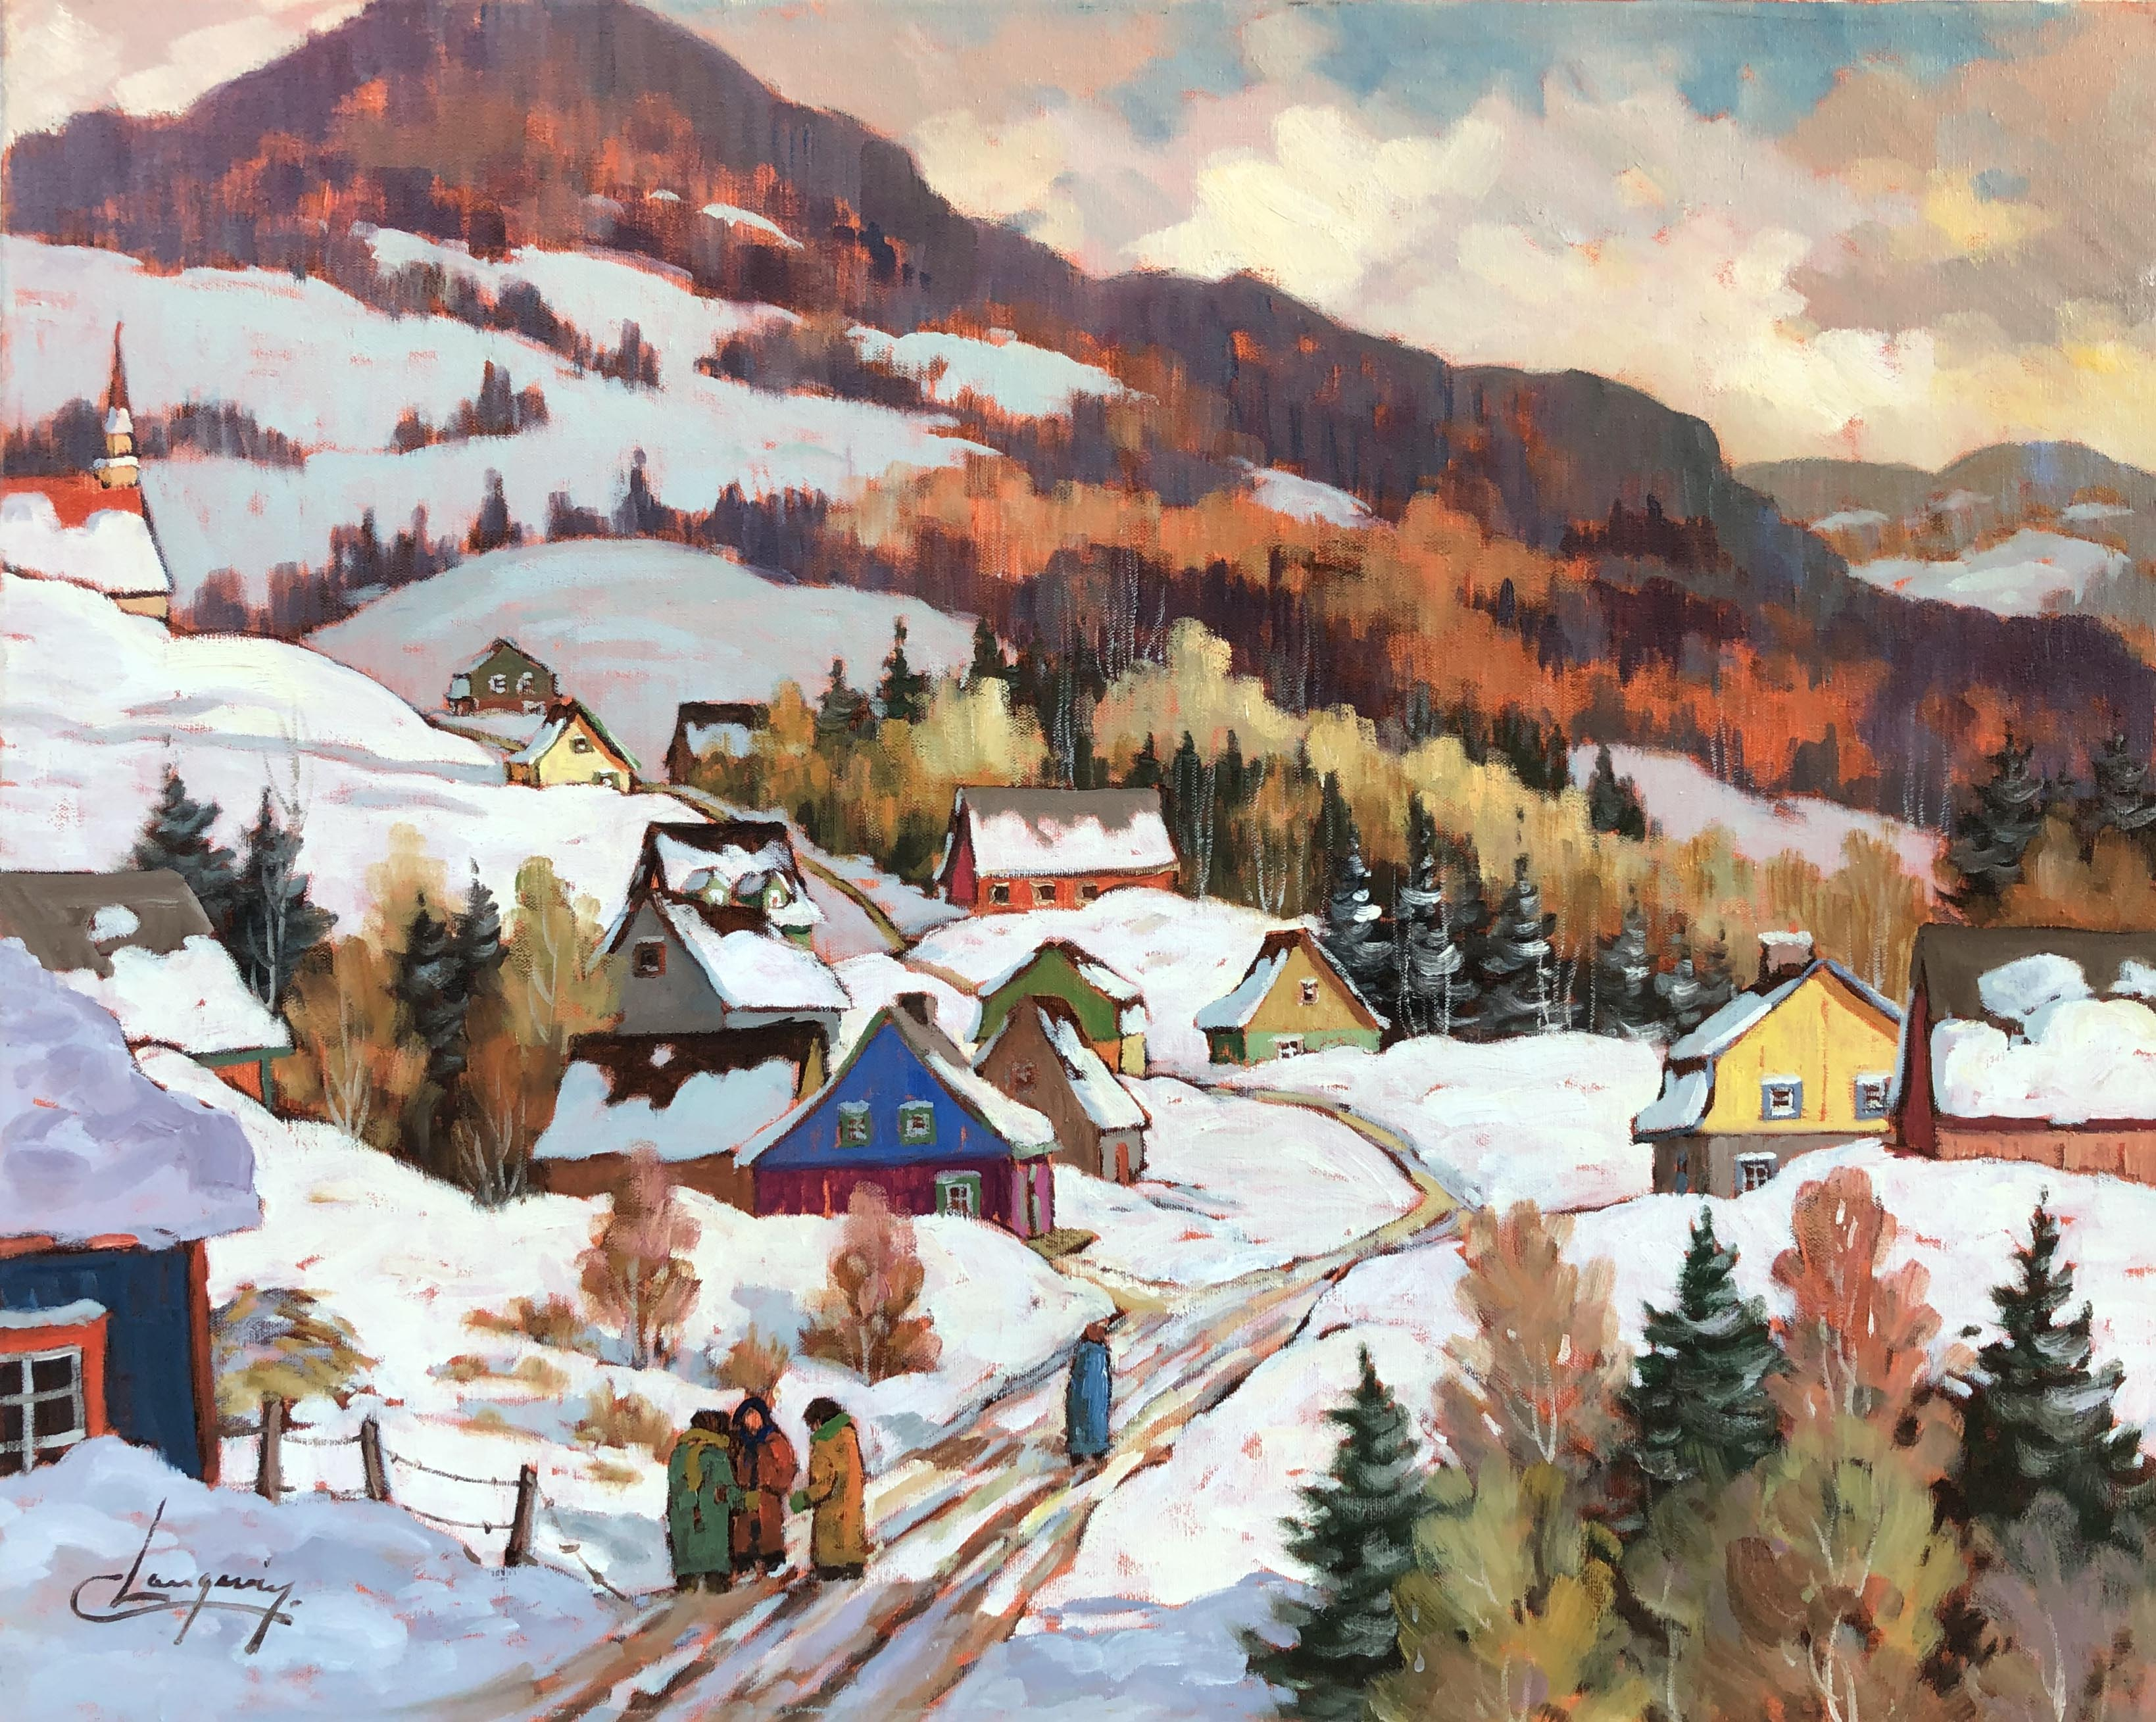 Entre Amis by  Claude Langevin - Masterpiece Online